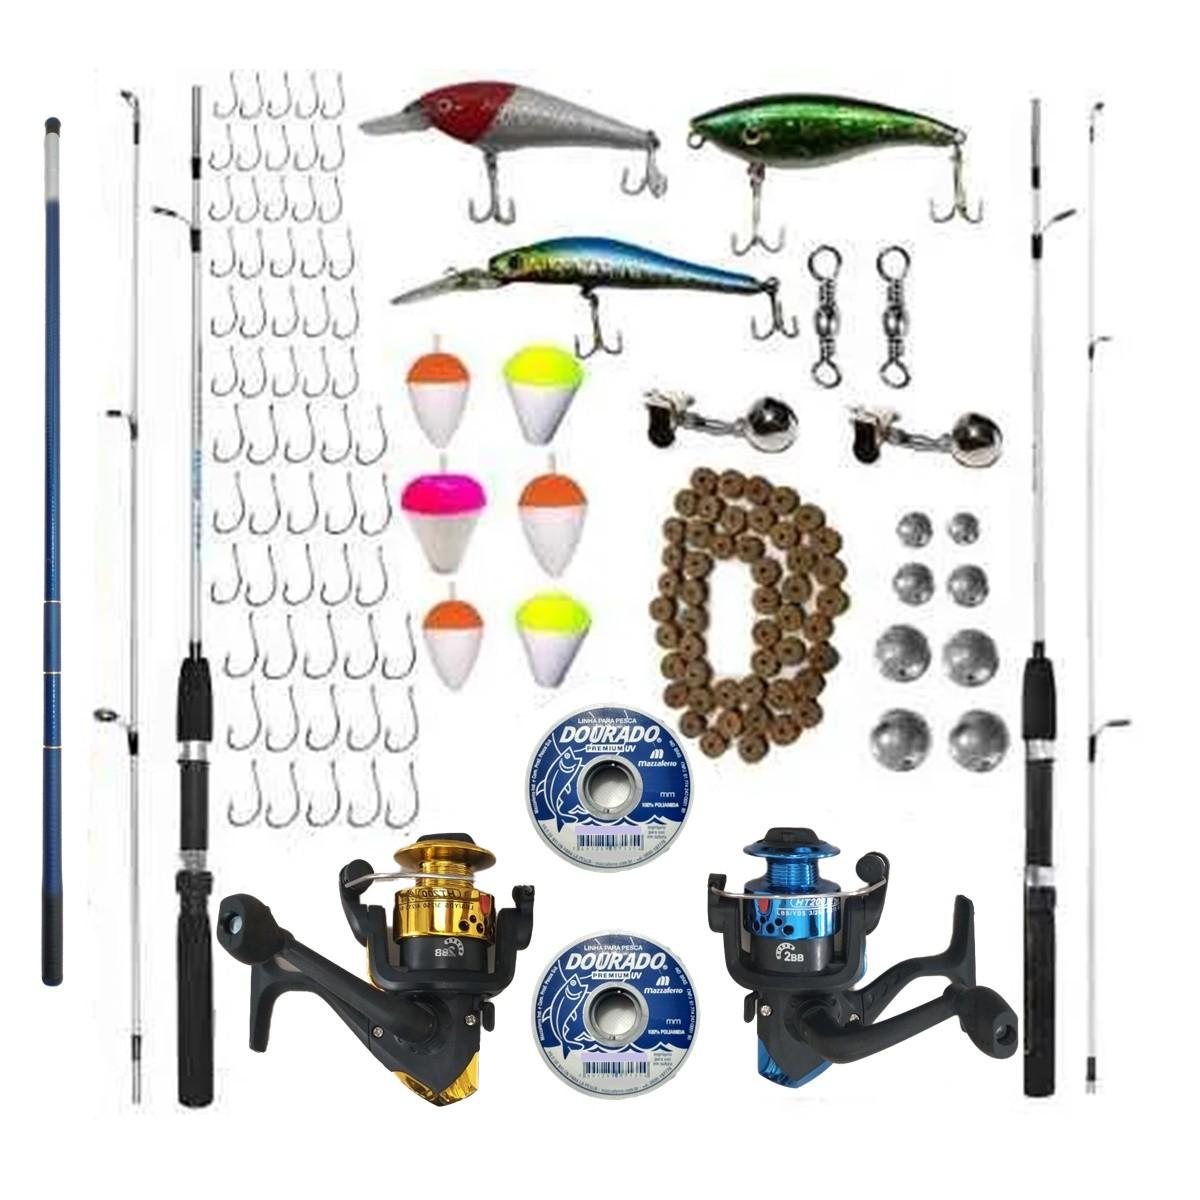 Kit Pesca Completo Vara Molinete Telescopica Pronto Para Uso